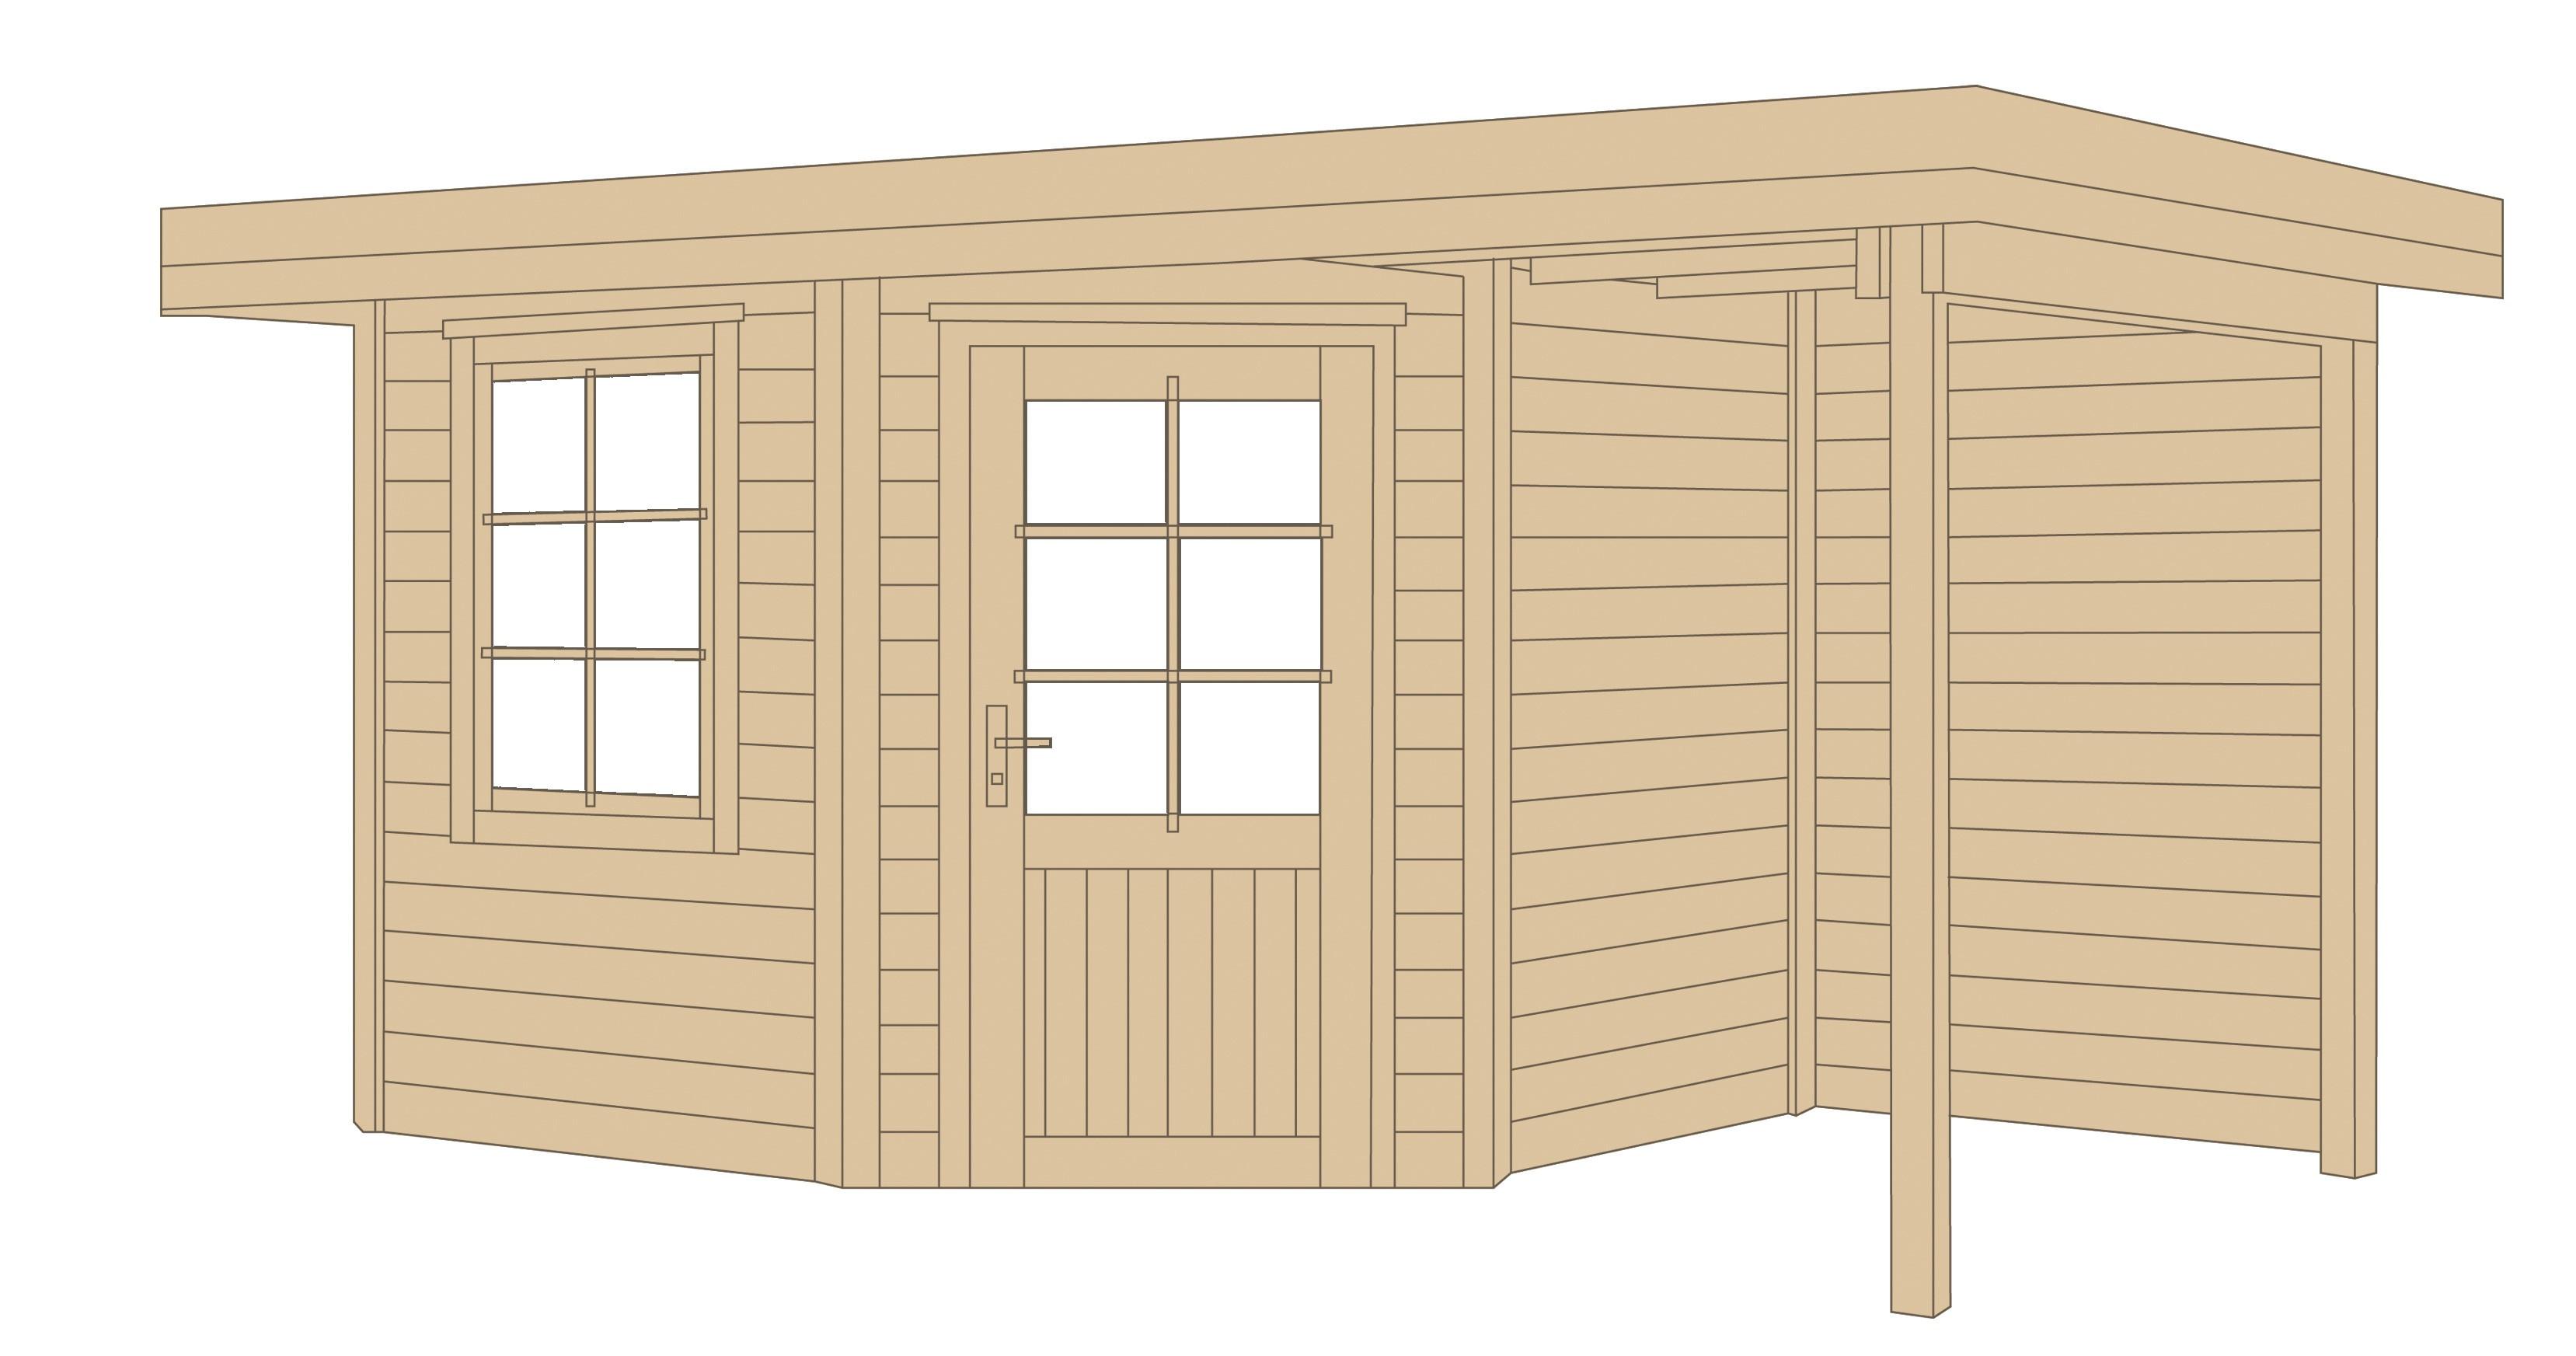 weka gartenhaus 28 mm designhaus 213a gr 2 anbau natur 501x338cm bei. Black Bedroom Furniture Sets. Home Design Ideas